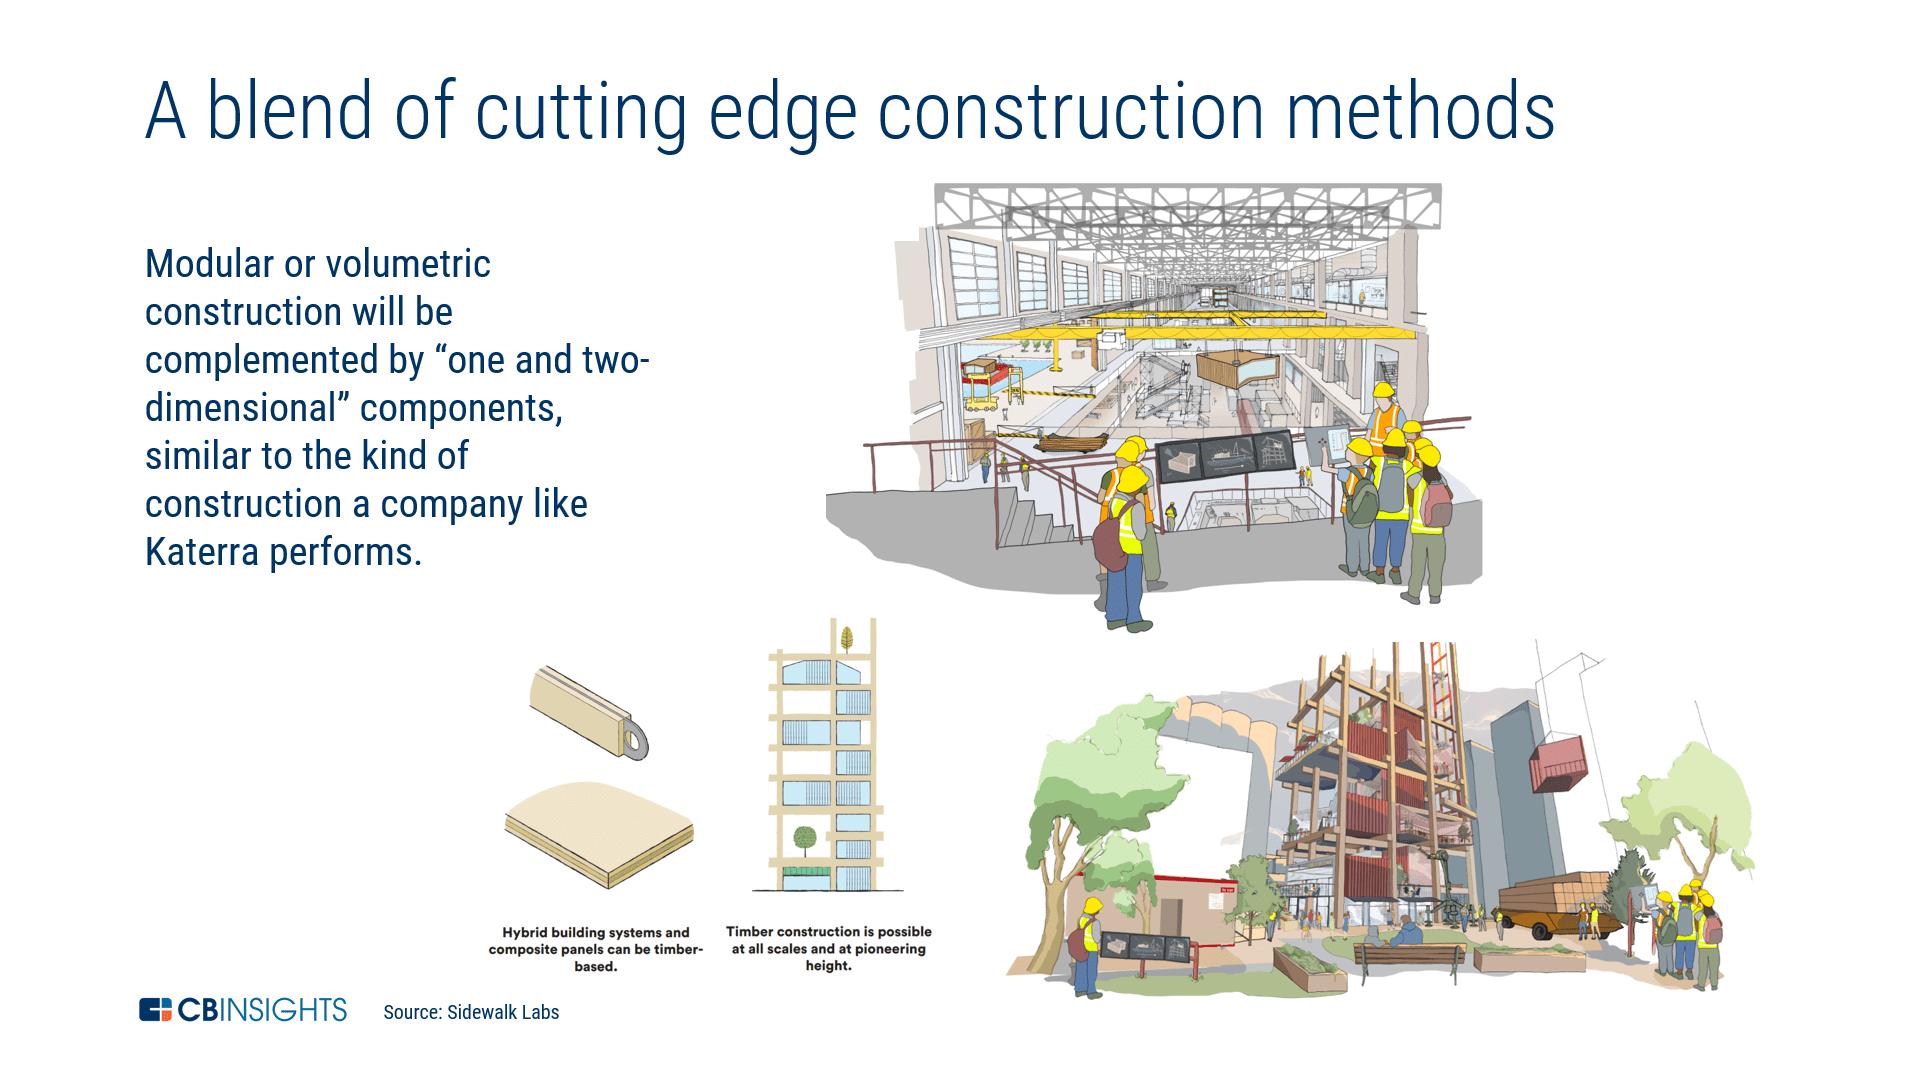 Sidewalk Labs' cutting edge construction technologies